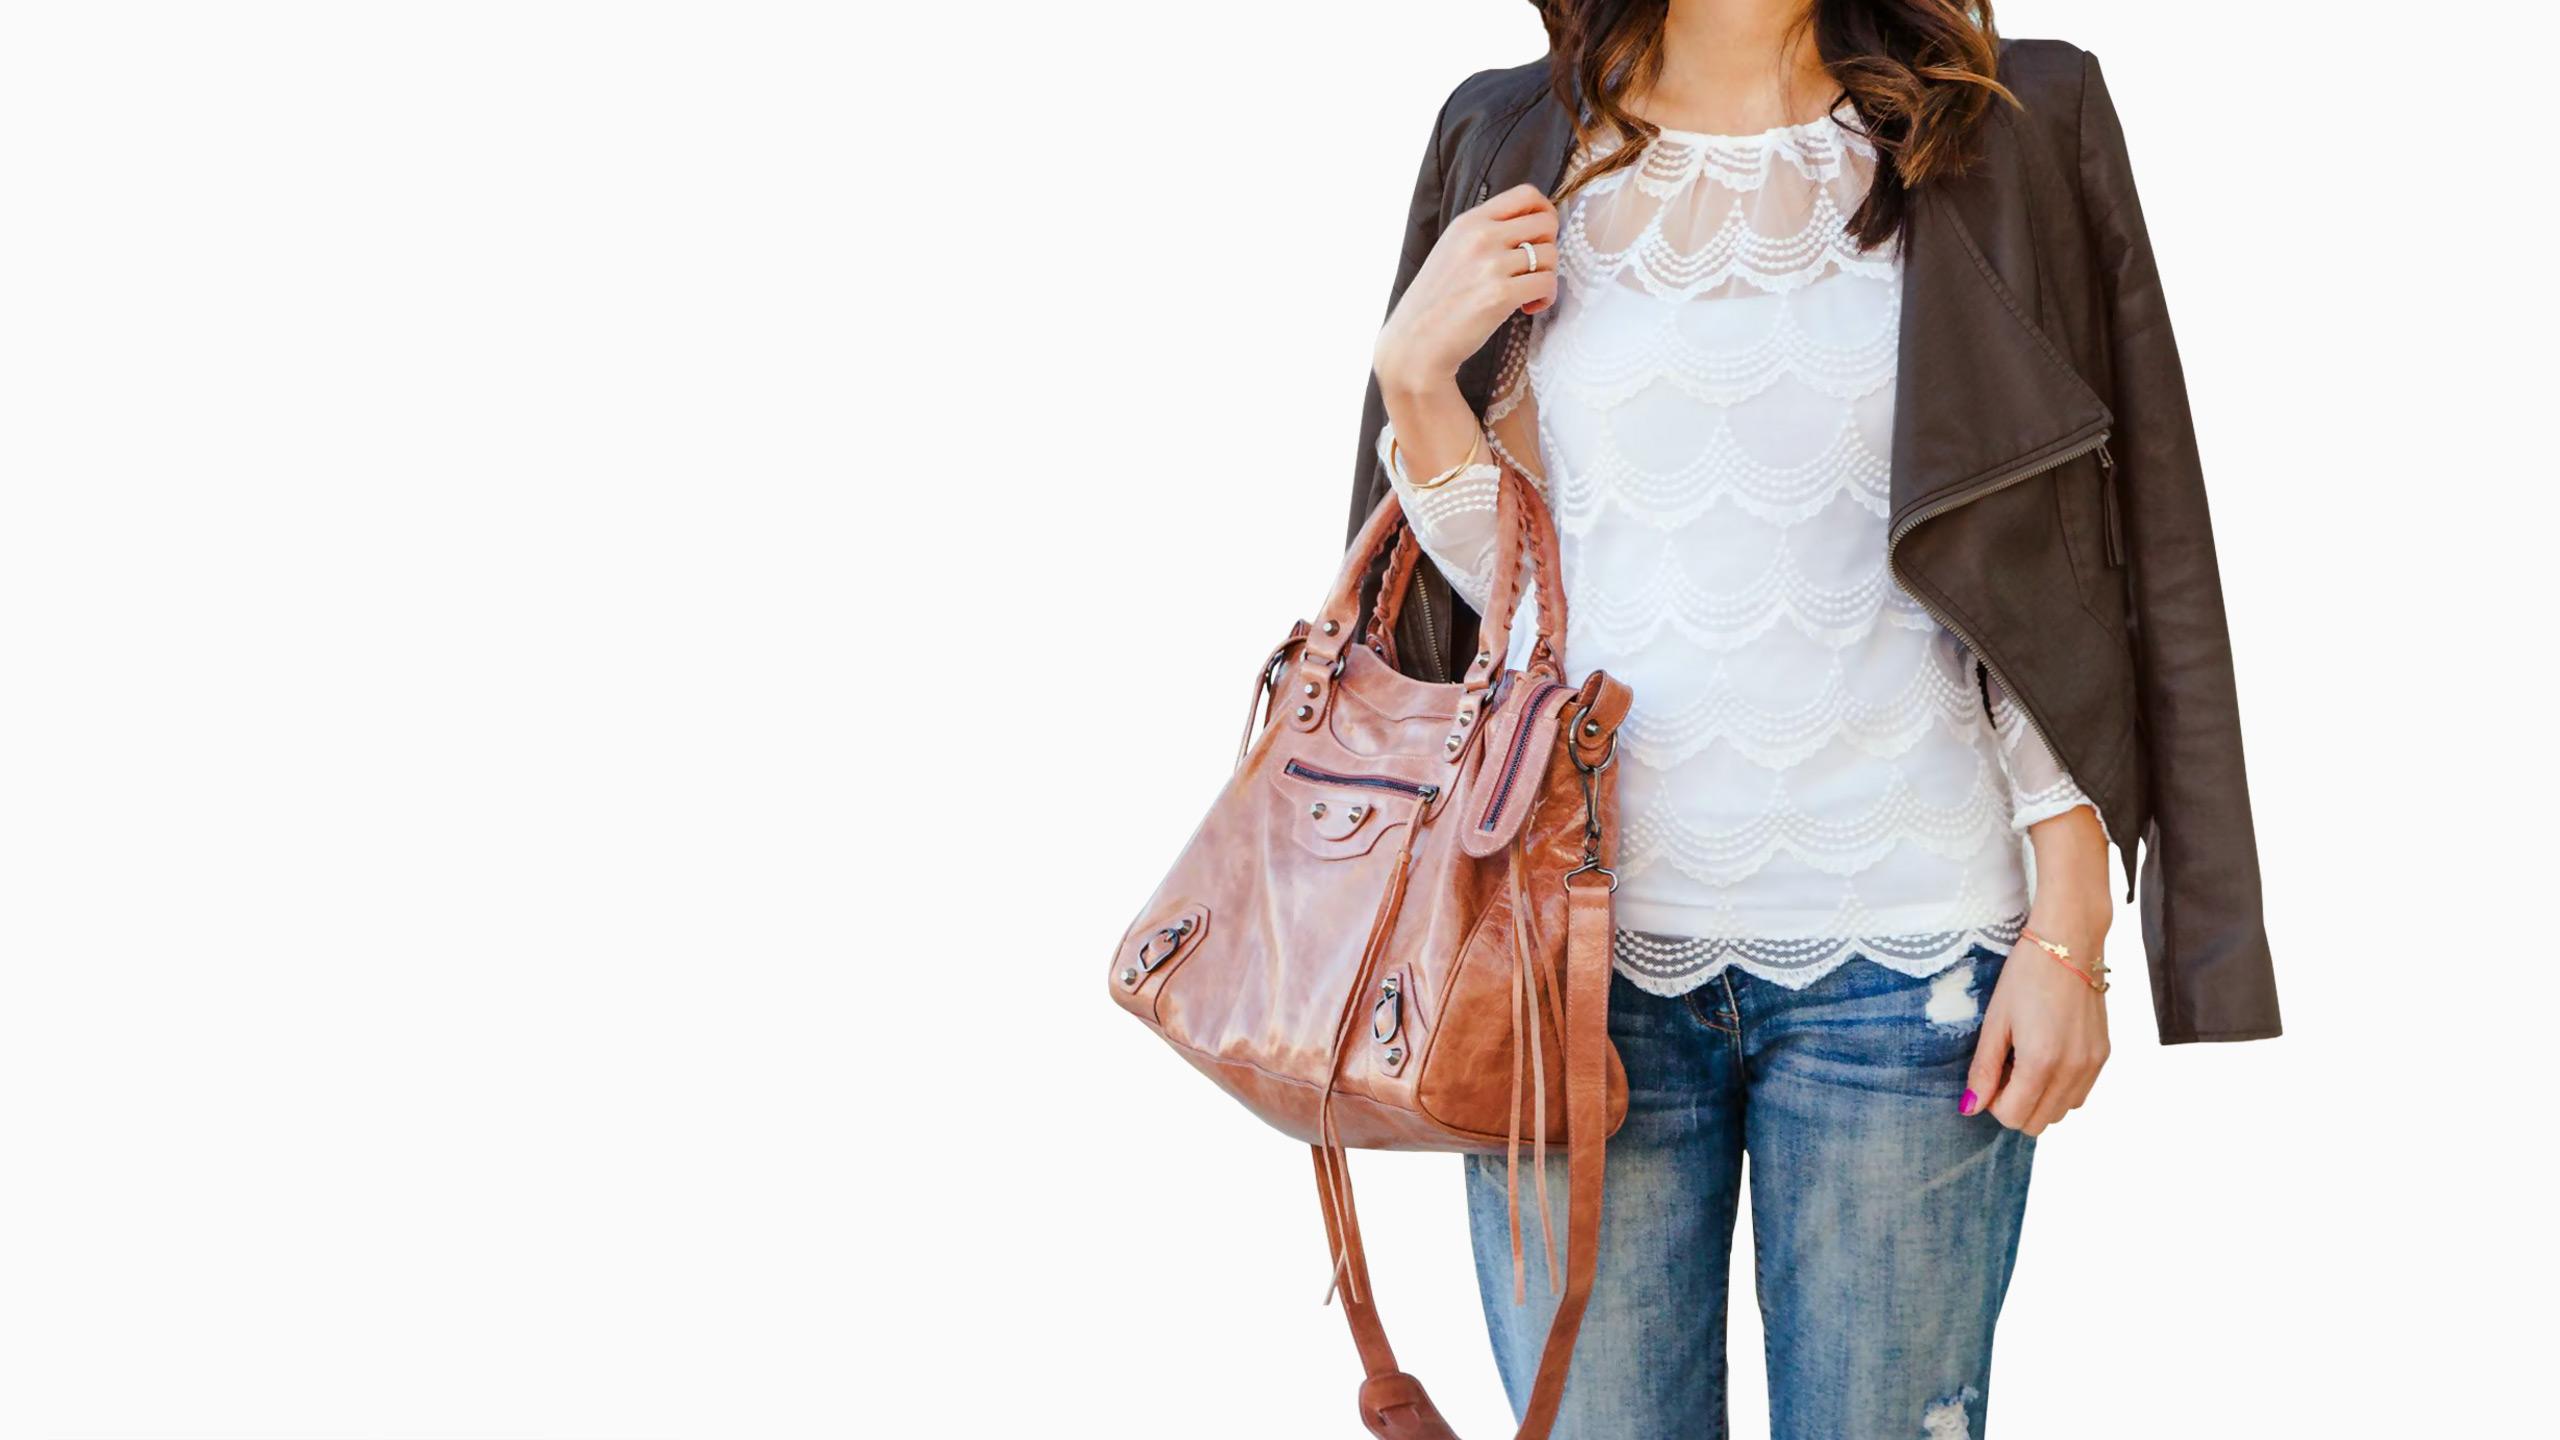 Poshmark raises $87.5 million for fashion resale marketplace